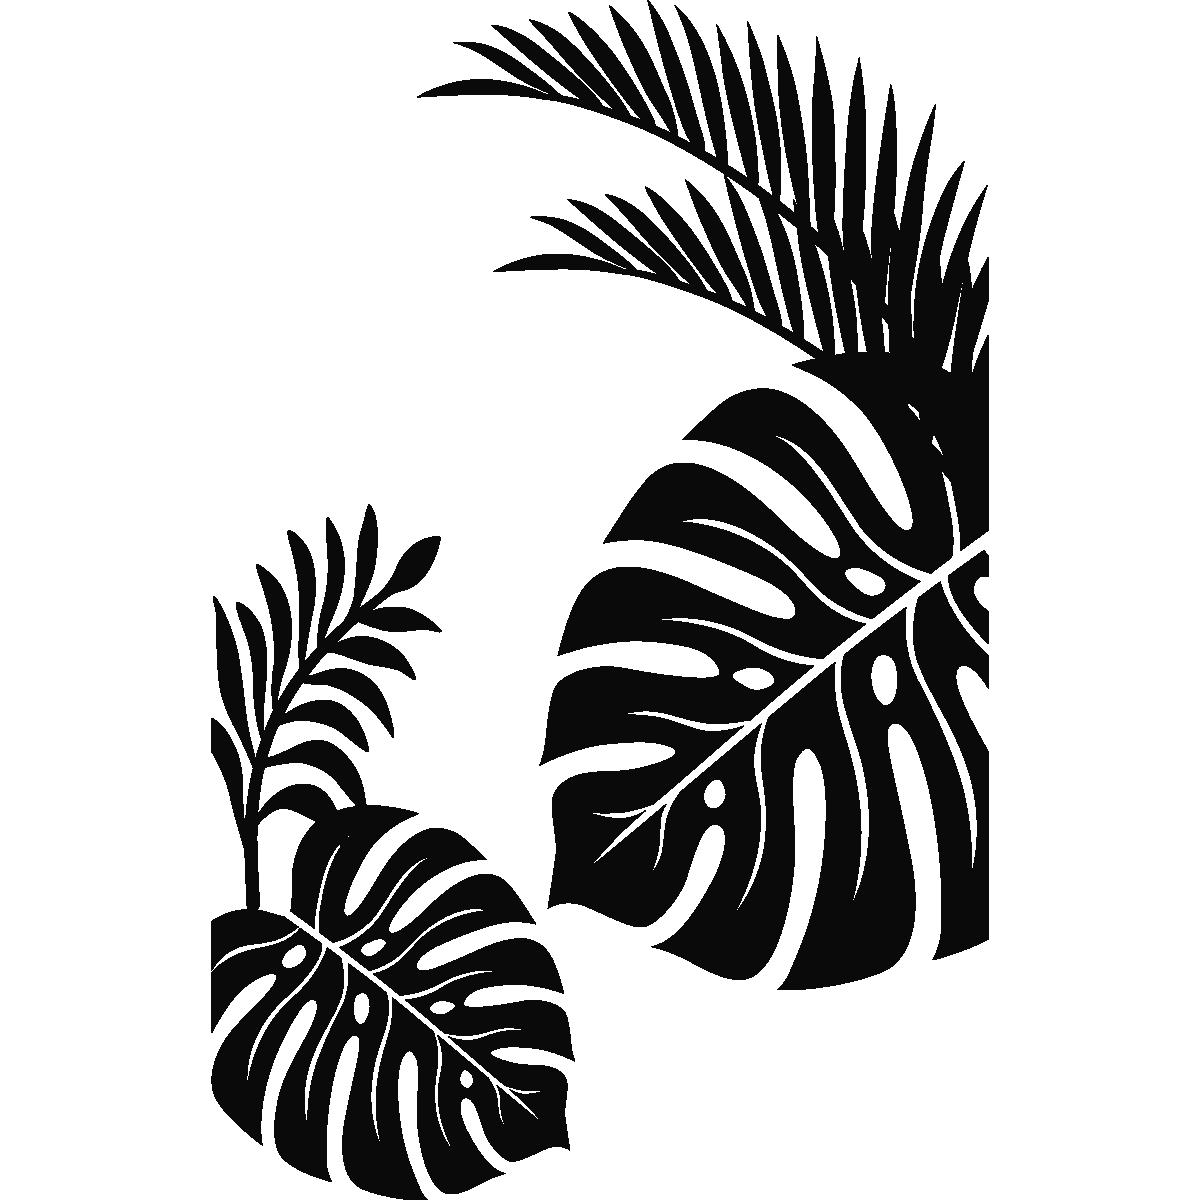 stickers muraux pour salle de bain sticker mural feuilles tropicales ambiance. Black Bedroom Furniture Sets. Home Design Ideas